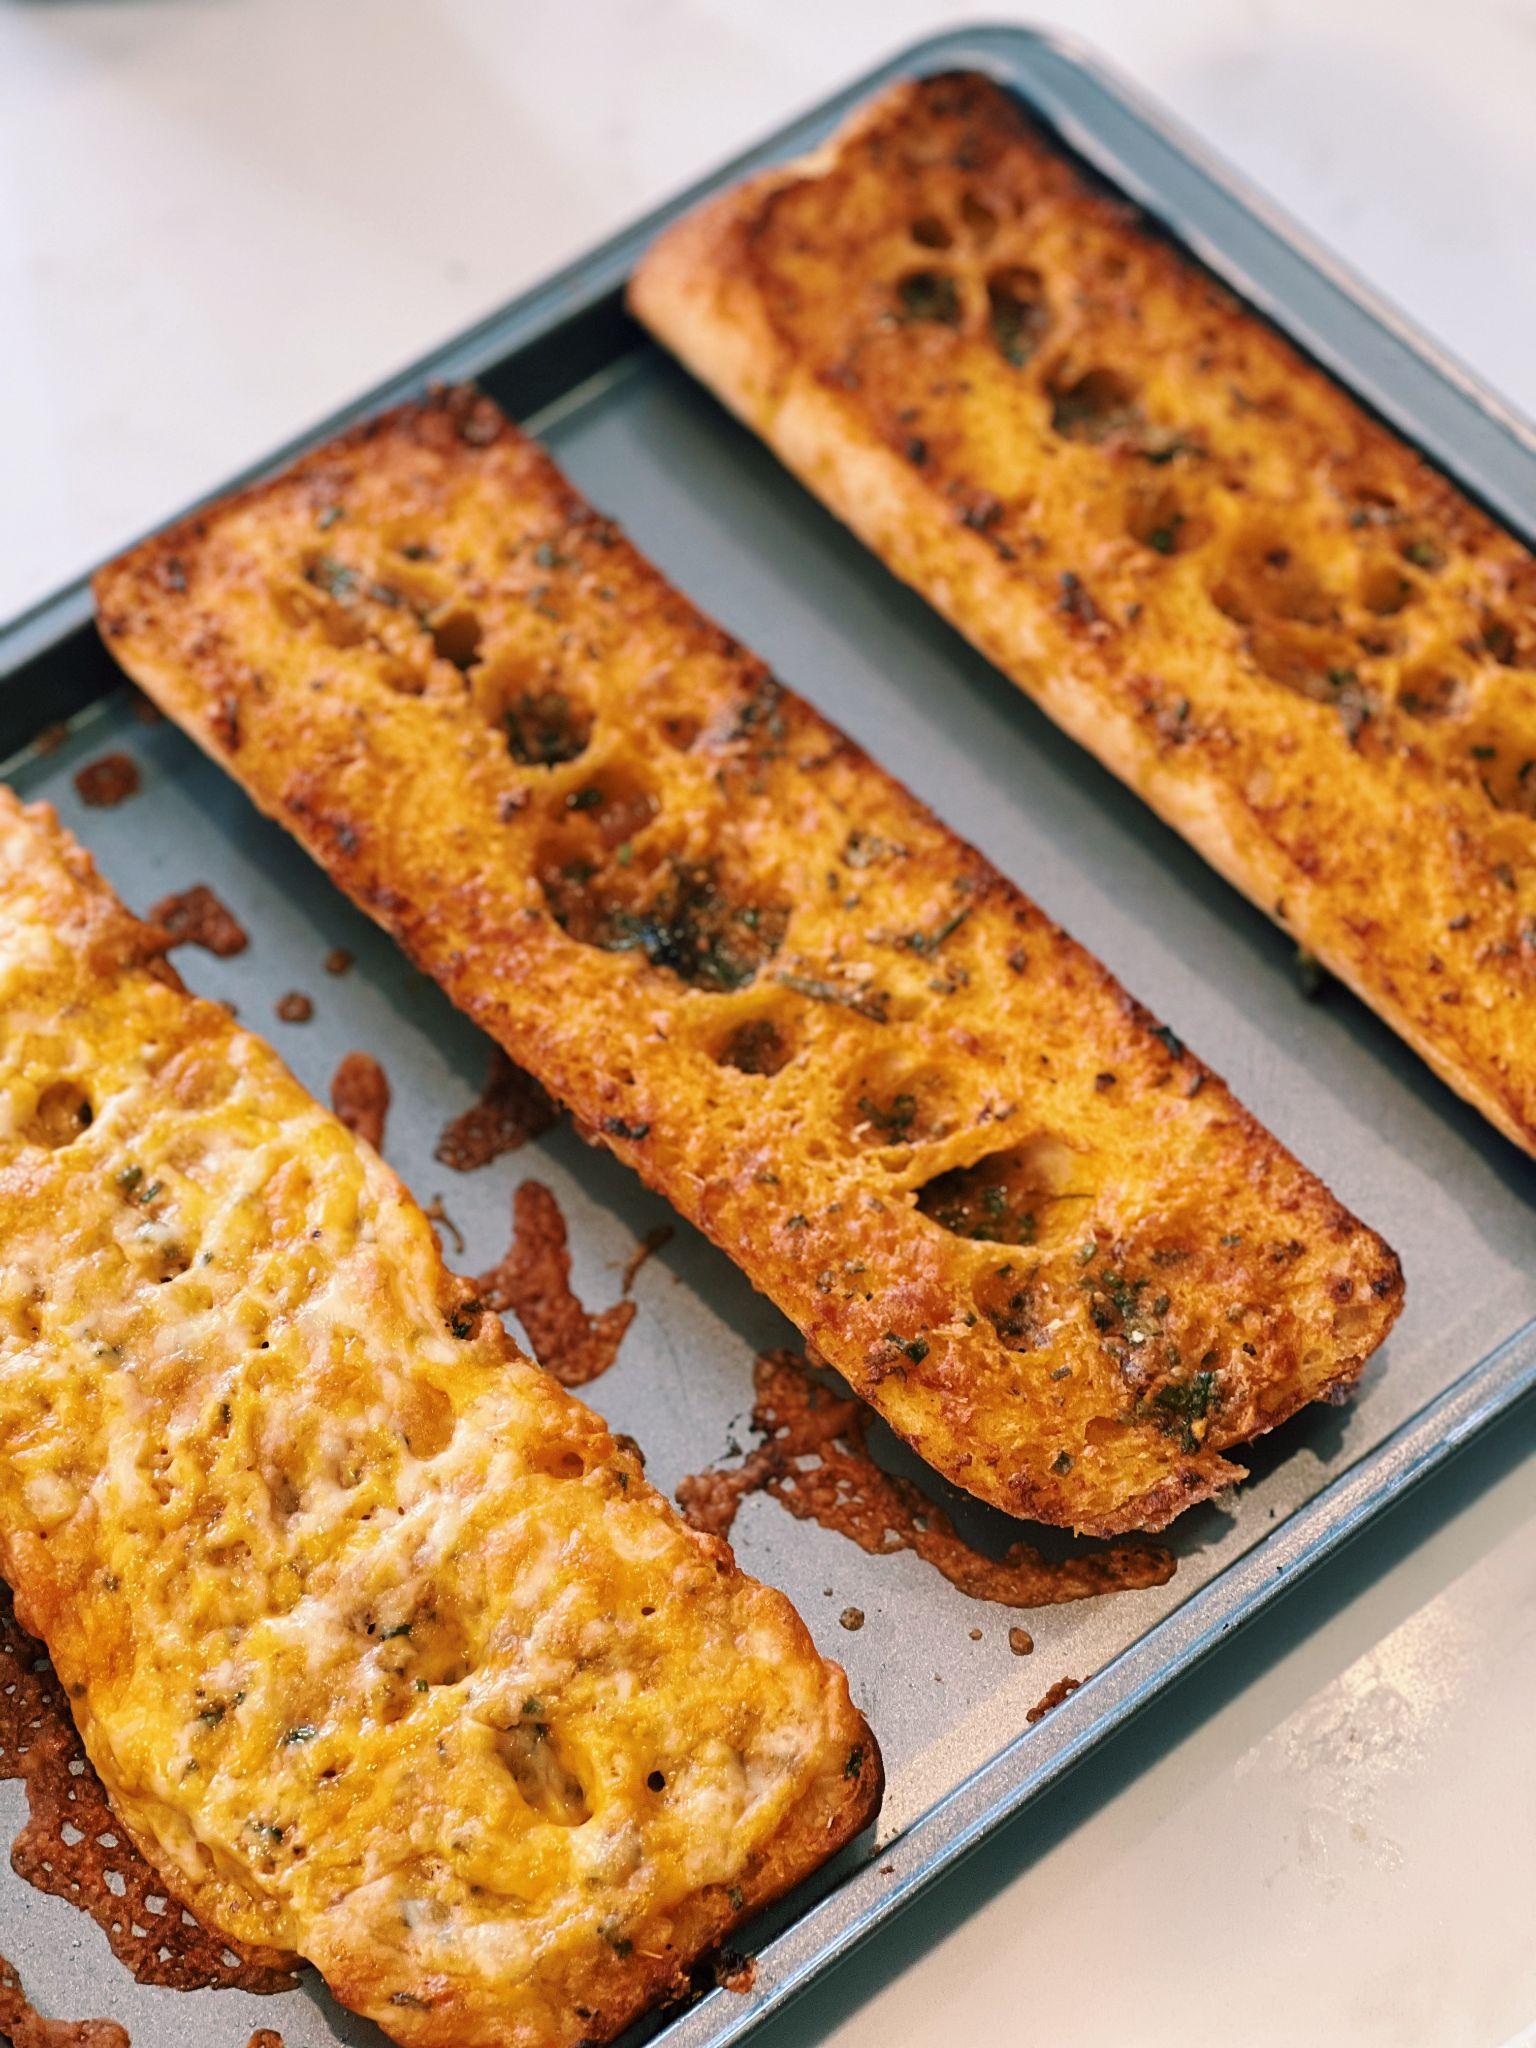 Korean Spicy Garlic Bread (MUST TRY!!)